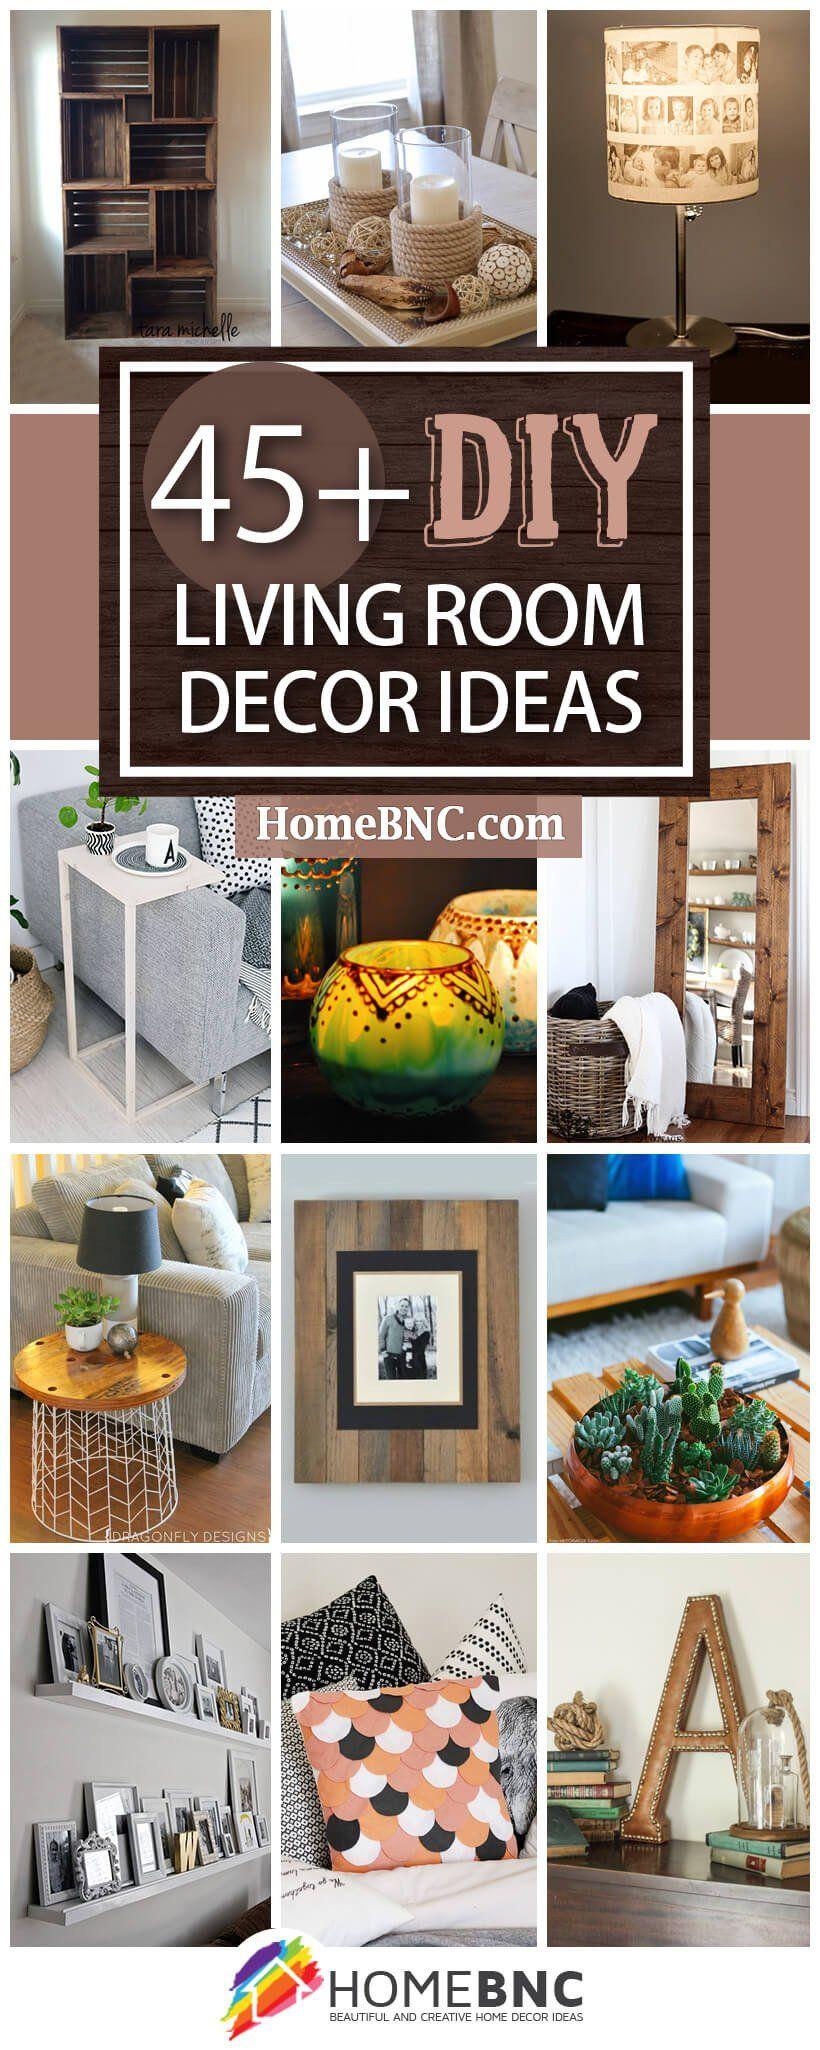 Interior Design Living Room Low Budget 45 Best Diy Living Room Decorating Ideas And Designs For 2020 In 2020 Diy Living Room Decor Wall Decor Living Room Living Decor